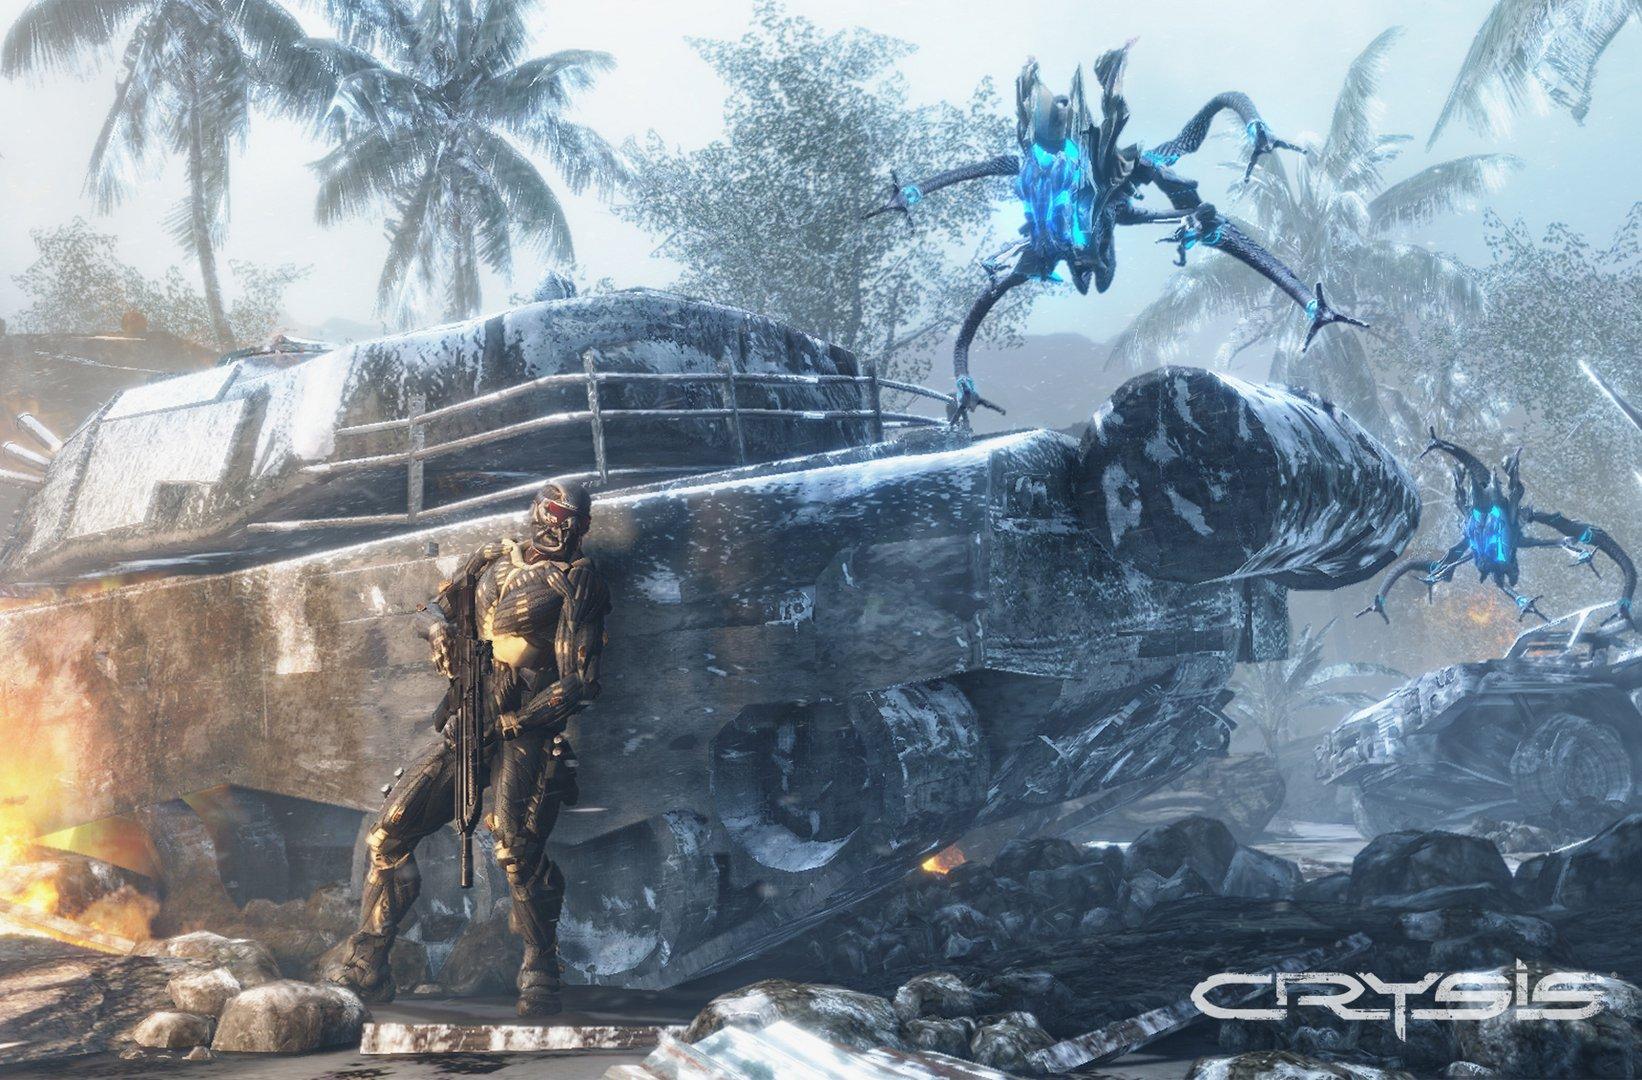 Crysis Maximum Edition 5